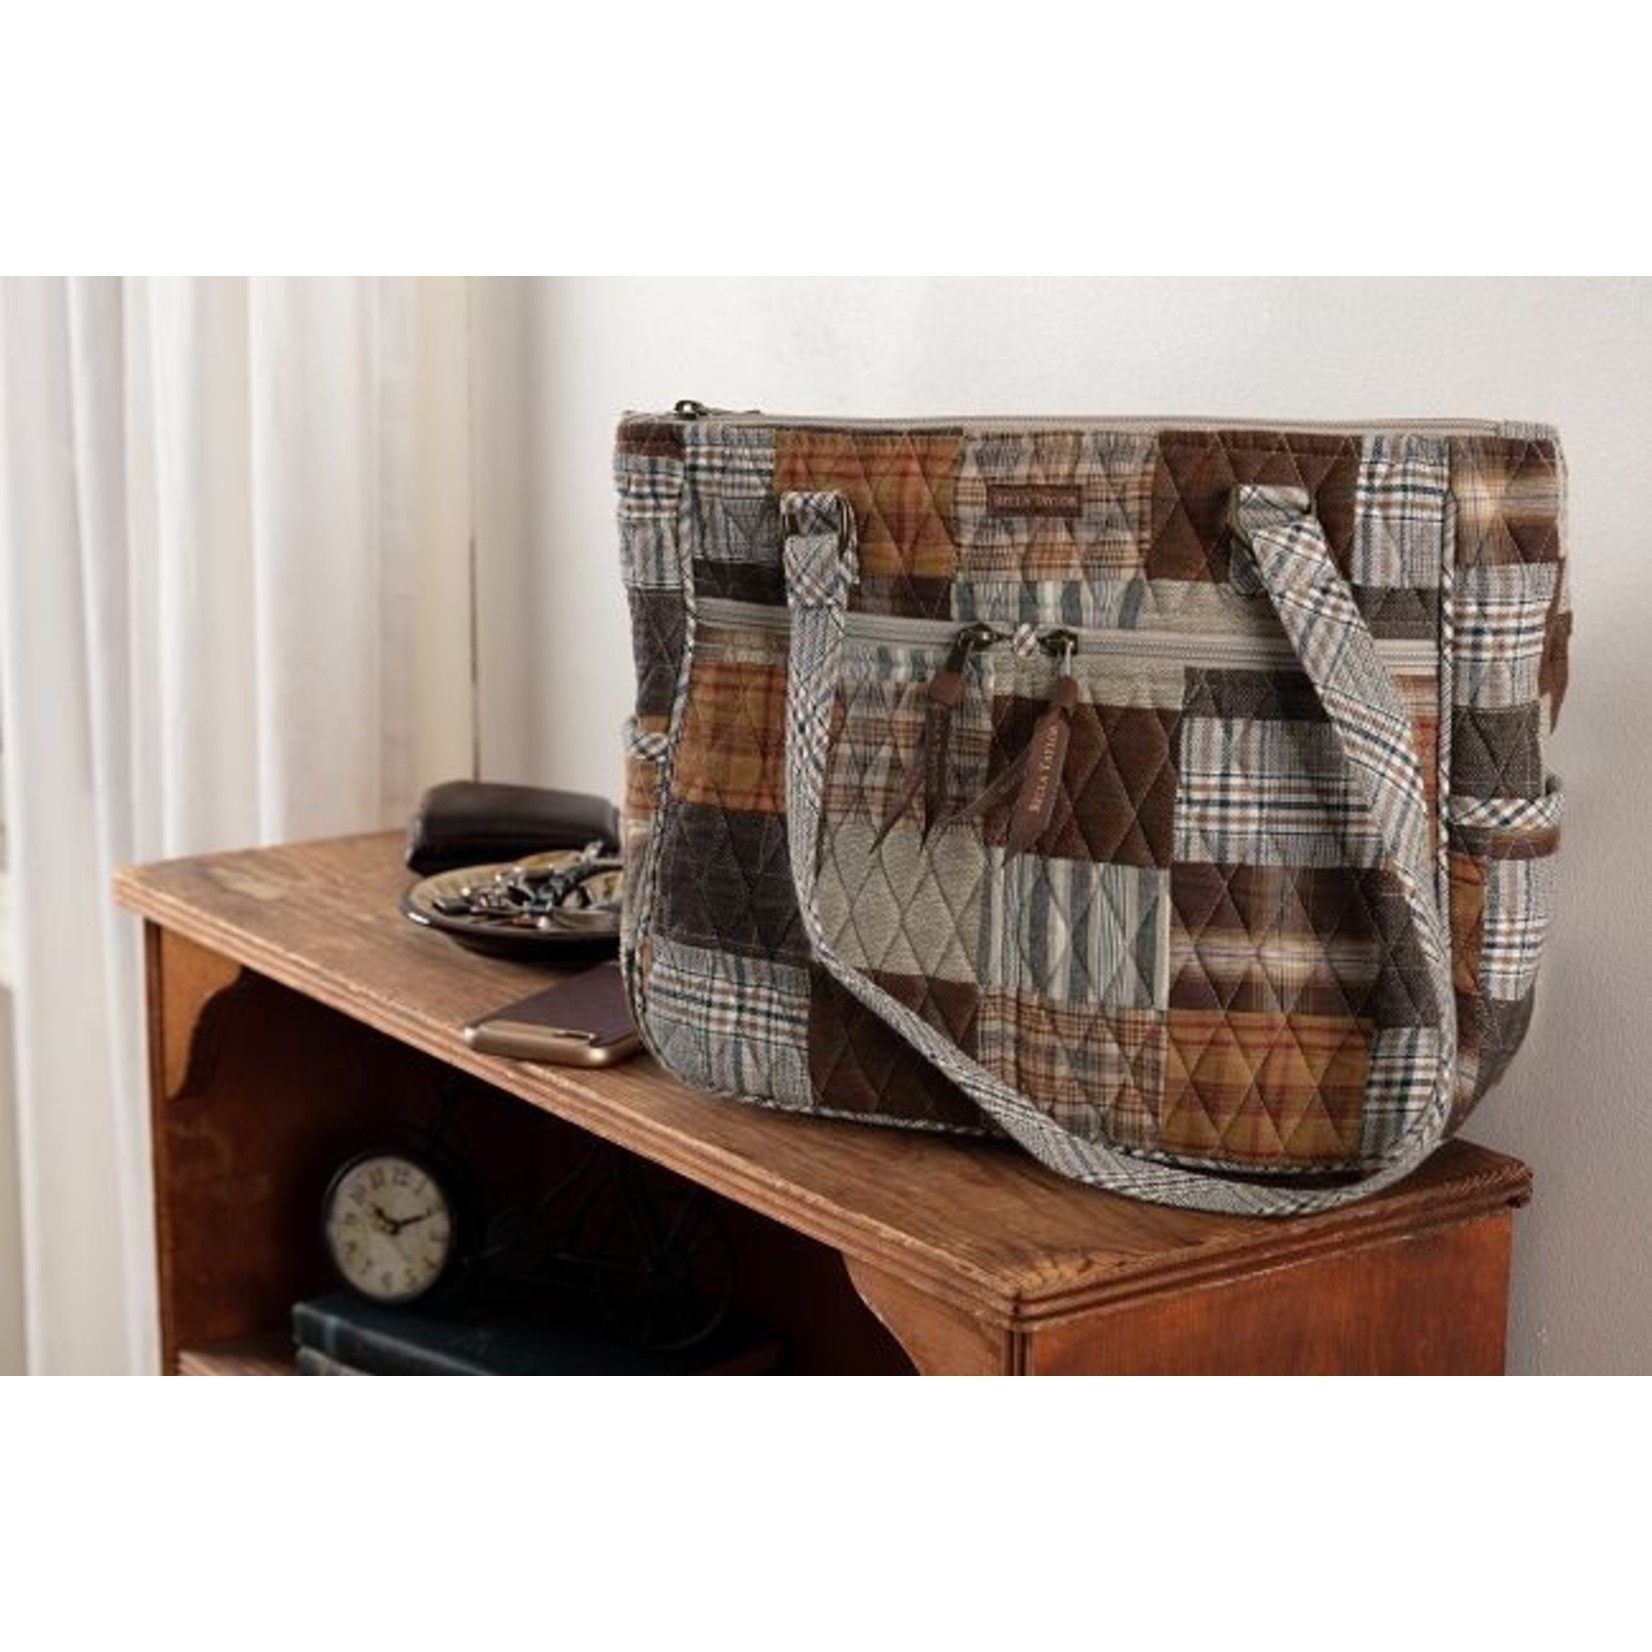 Bella Taylor Rory - Everyday handbag